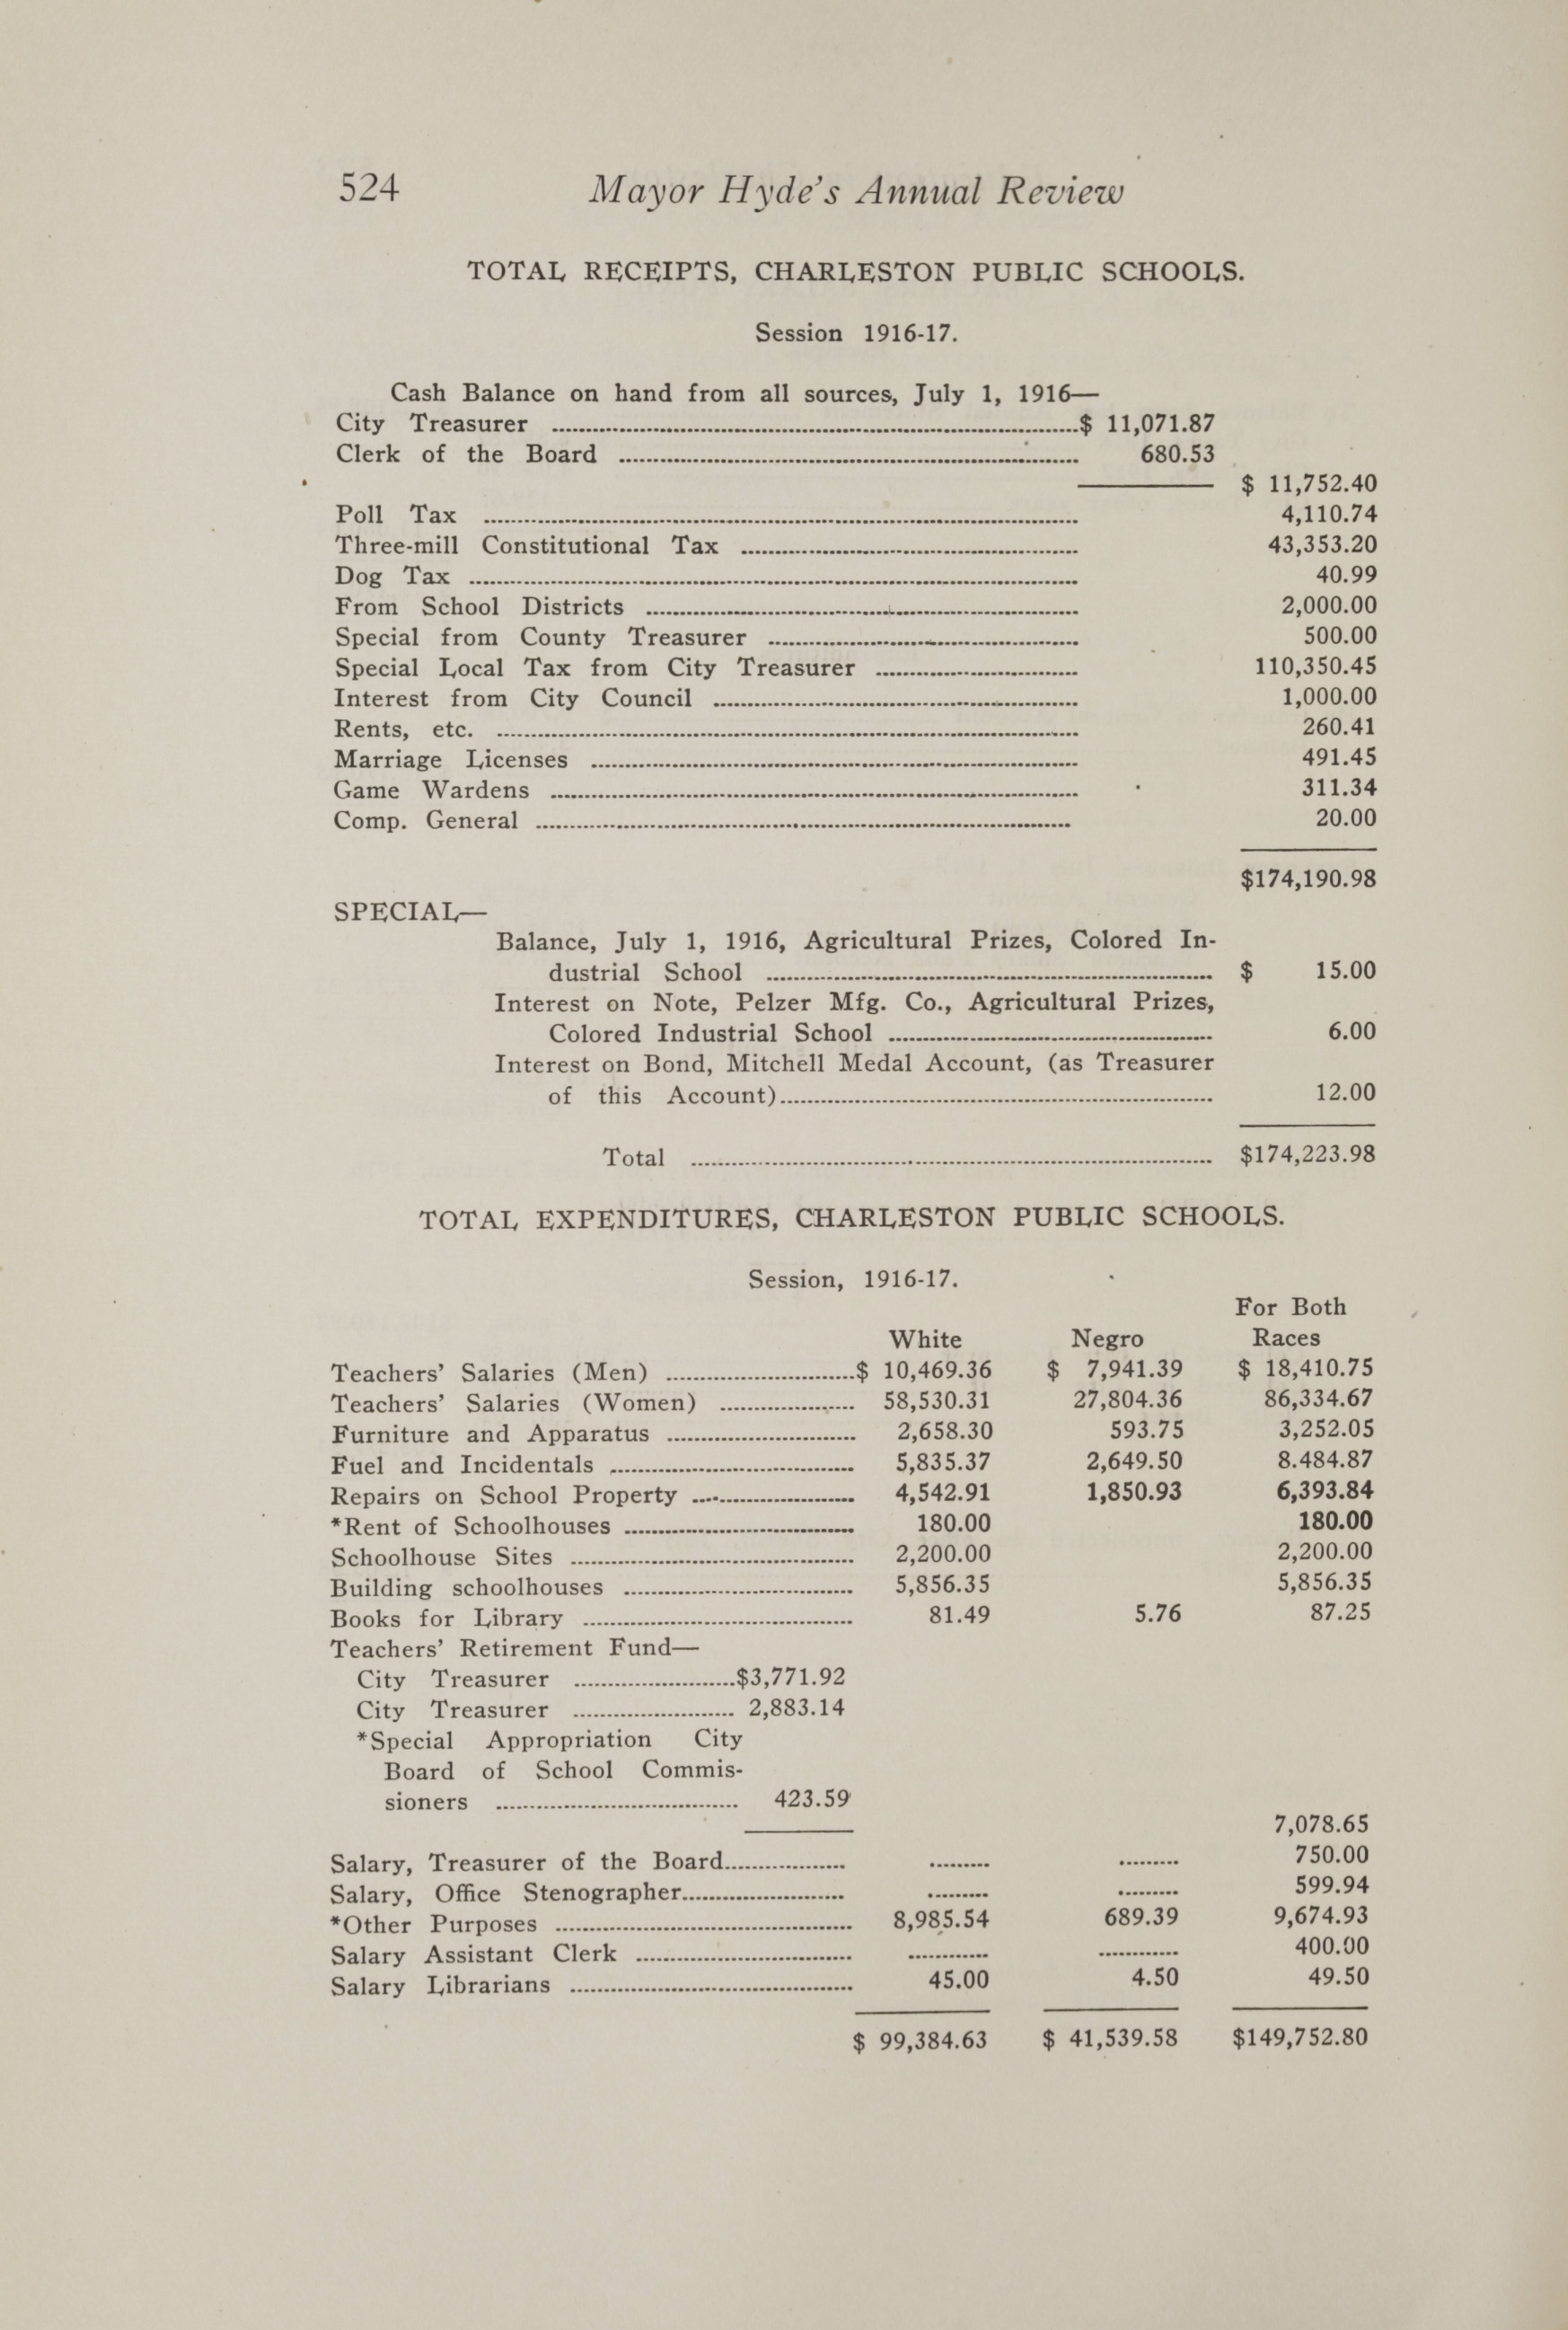 Charleston Yearbook, 1917, page 524